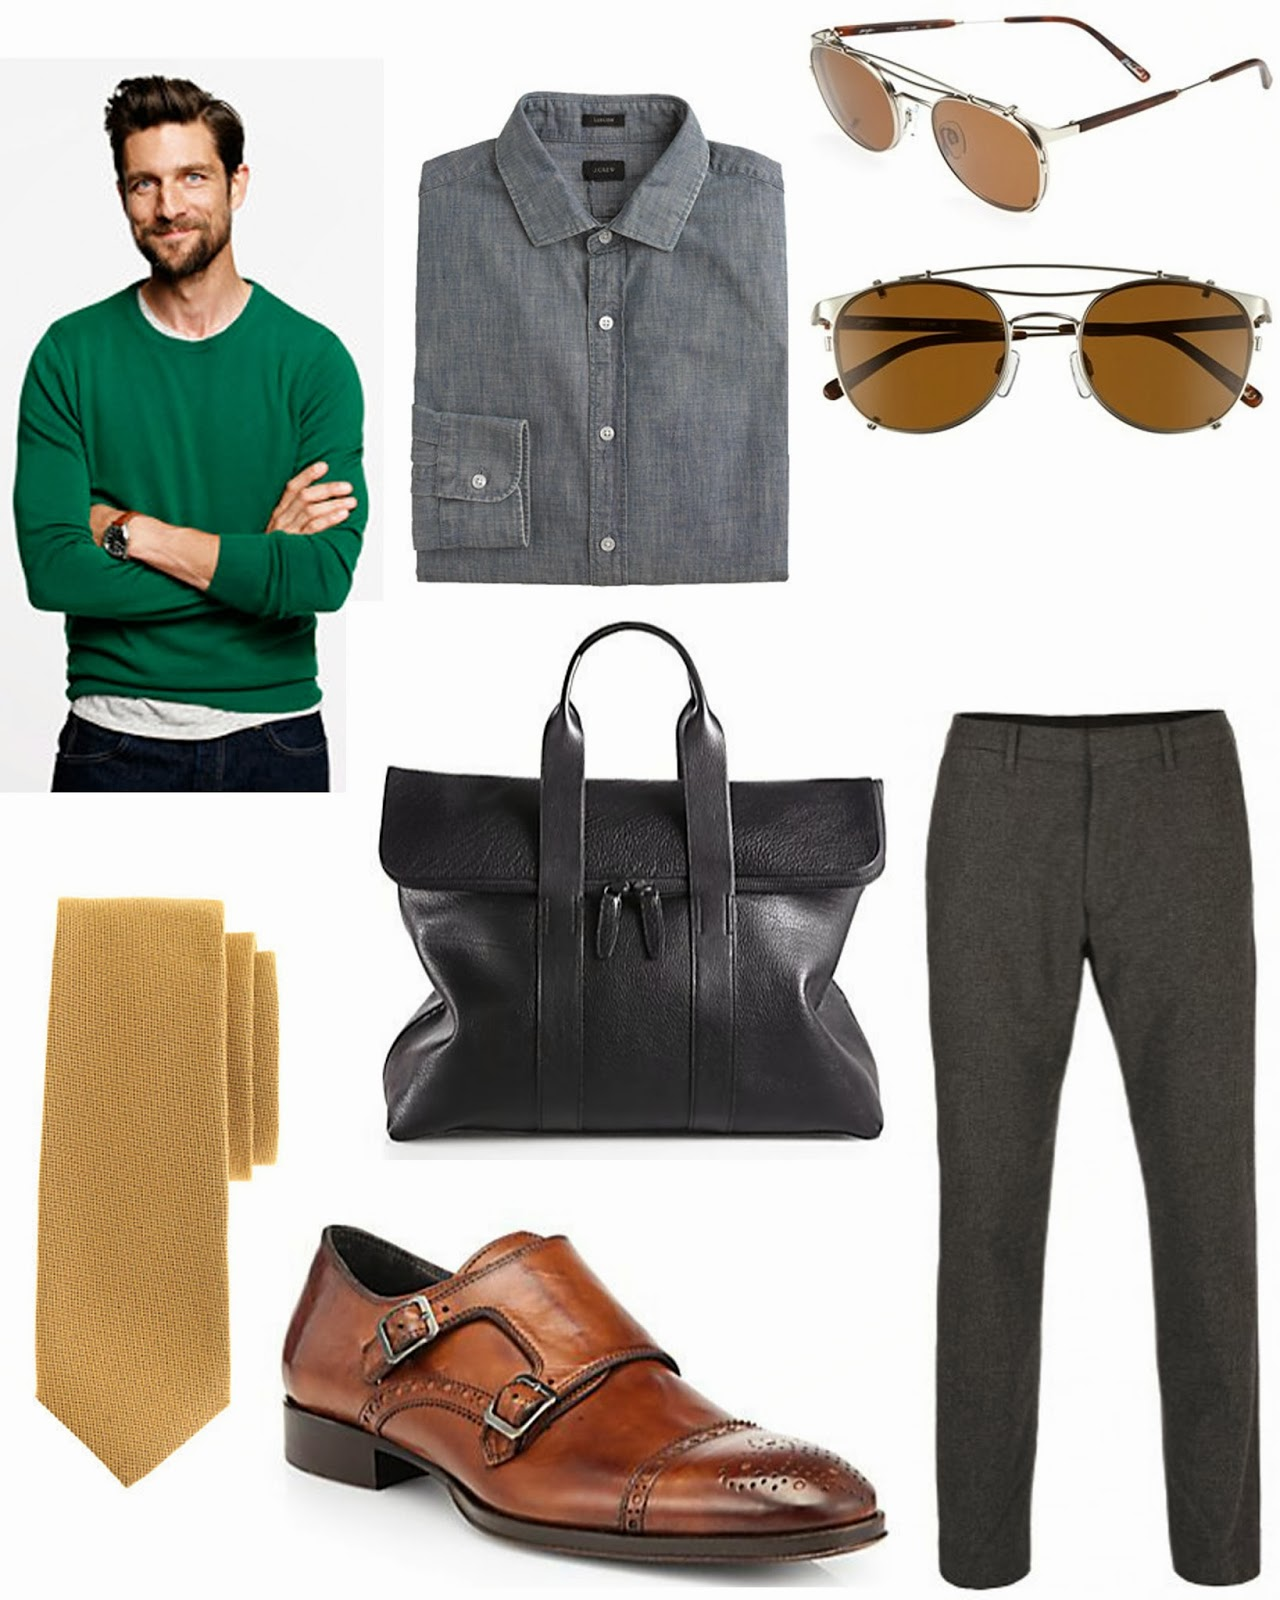 fashion blog, style blog, mens fashion, mens style, mens ootd, ootd